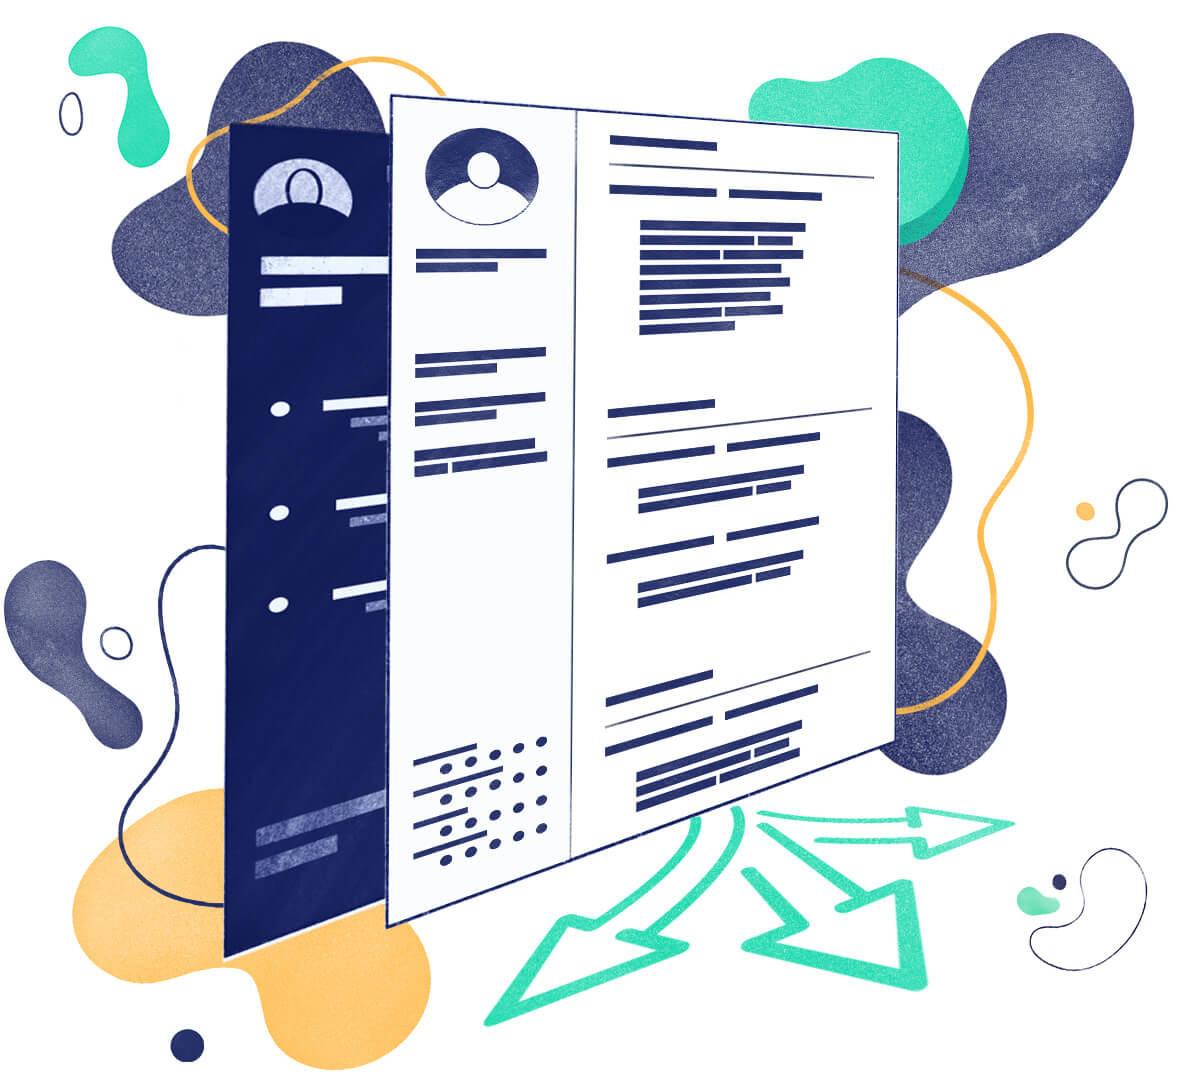 Skills-Based CV: See a Functional CV Template  + Examples